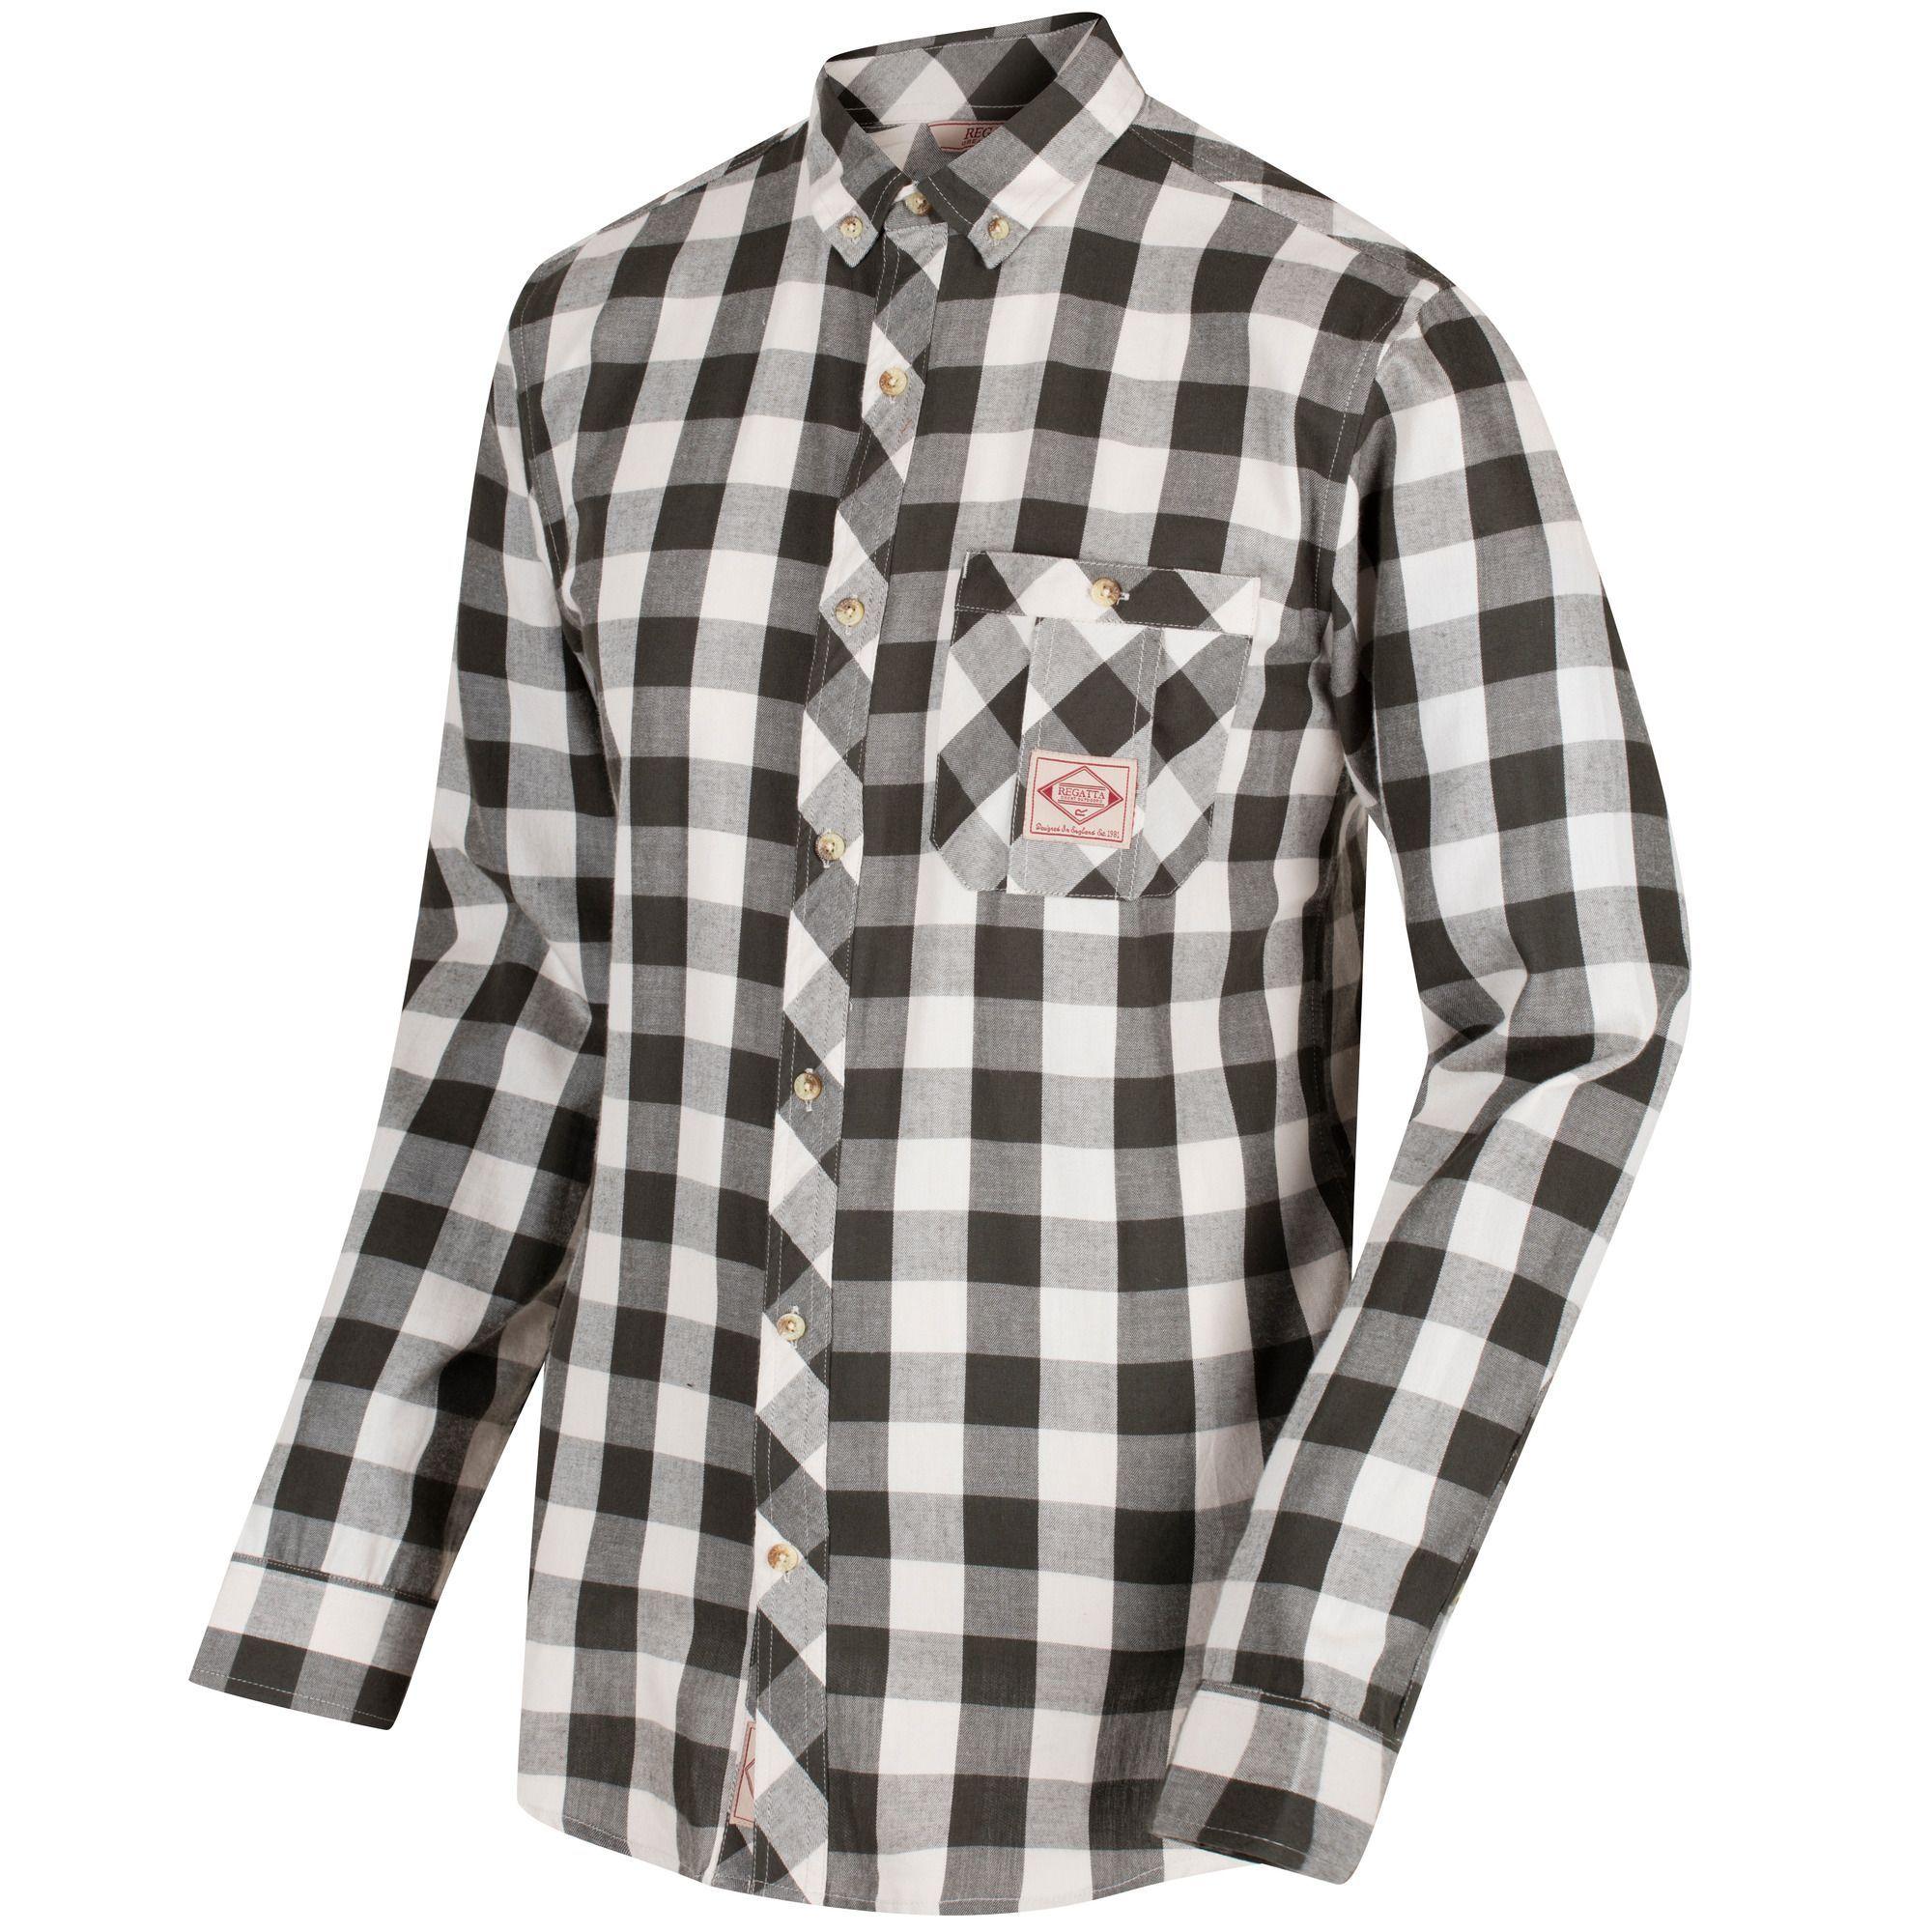 Regatta Great Outdoors Mens Loman Long Sleeve Check Shirt